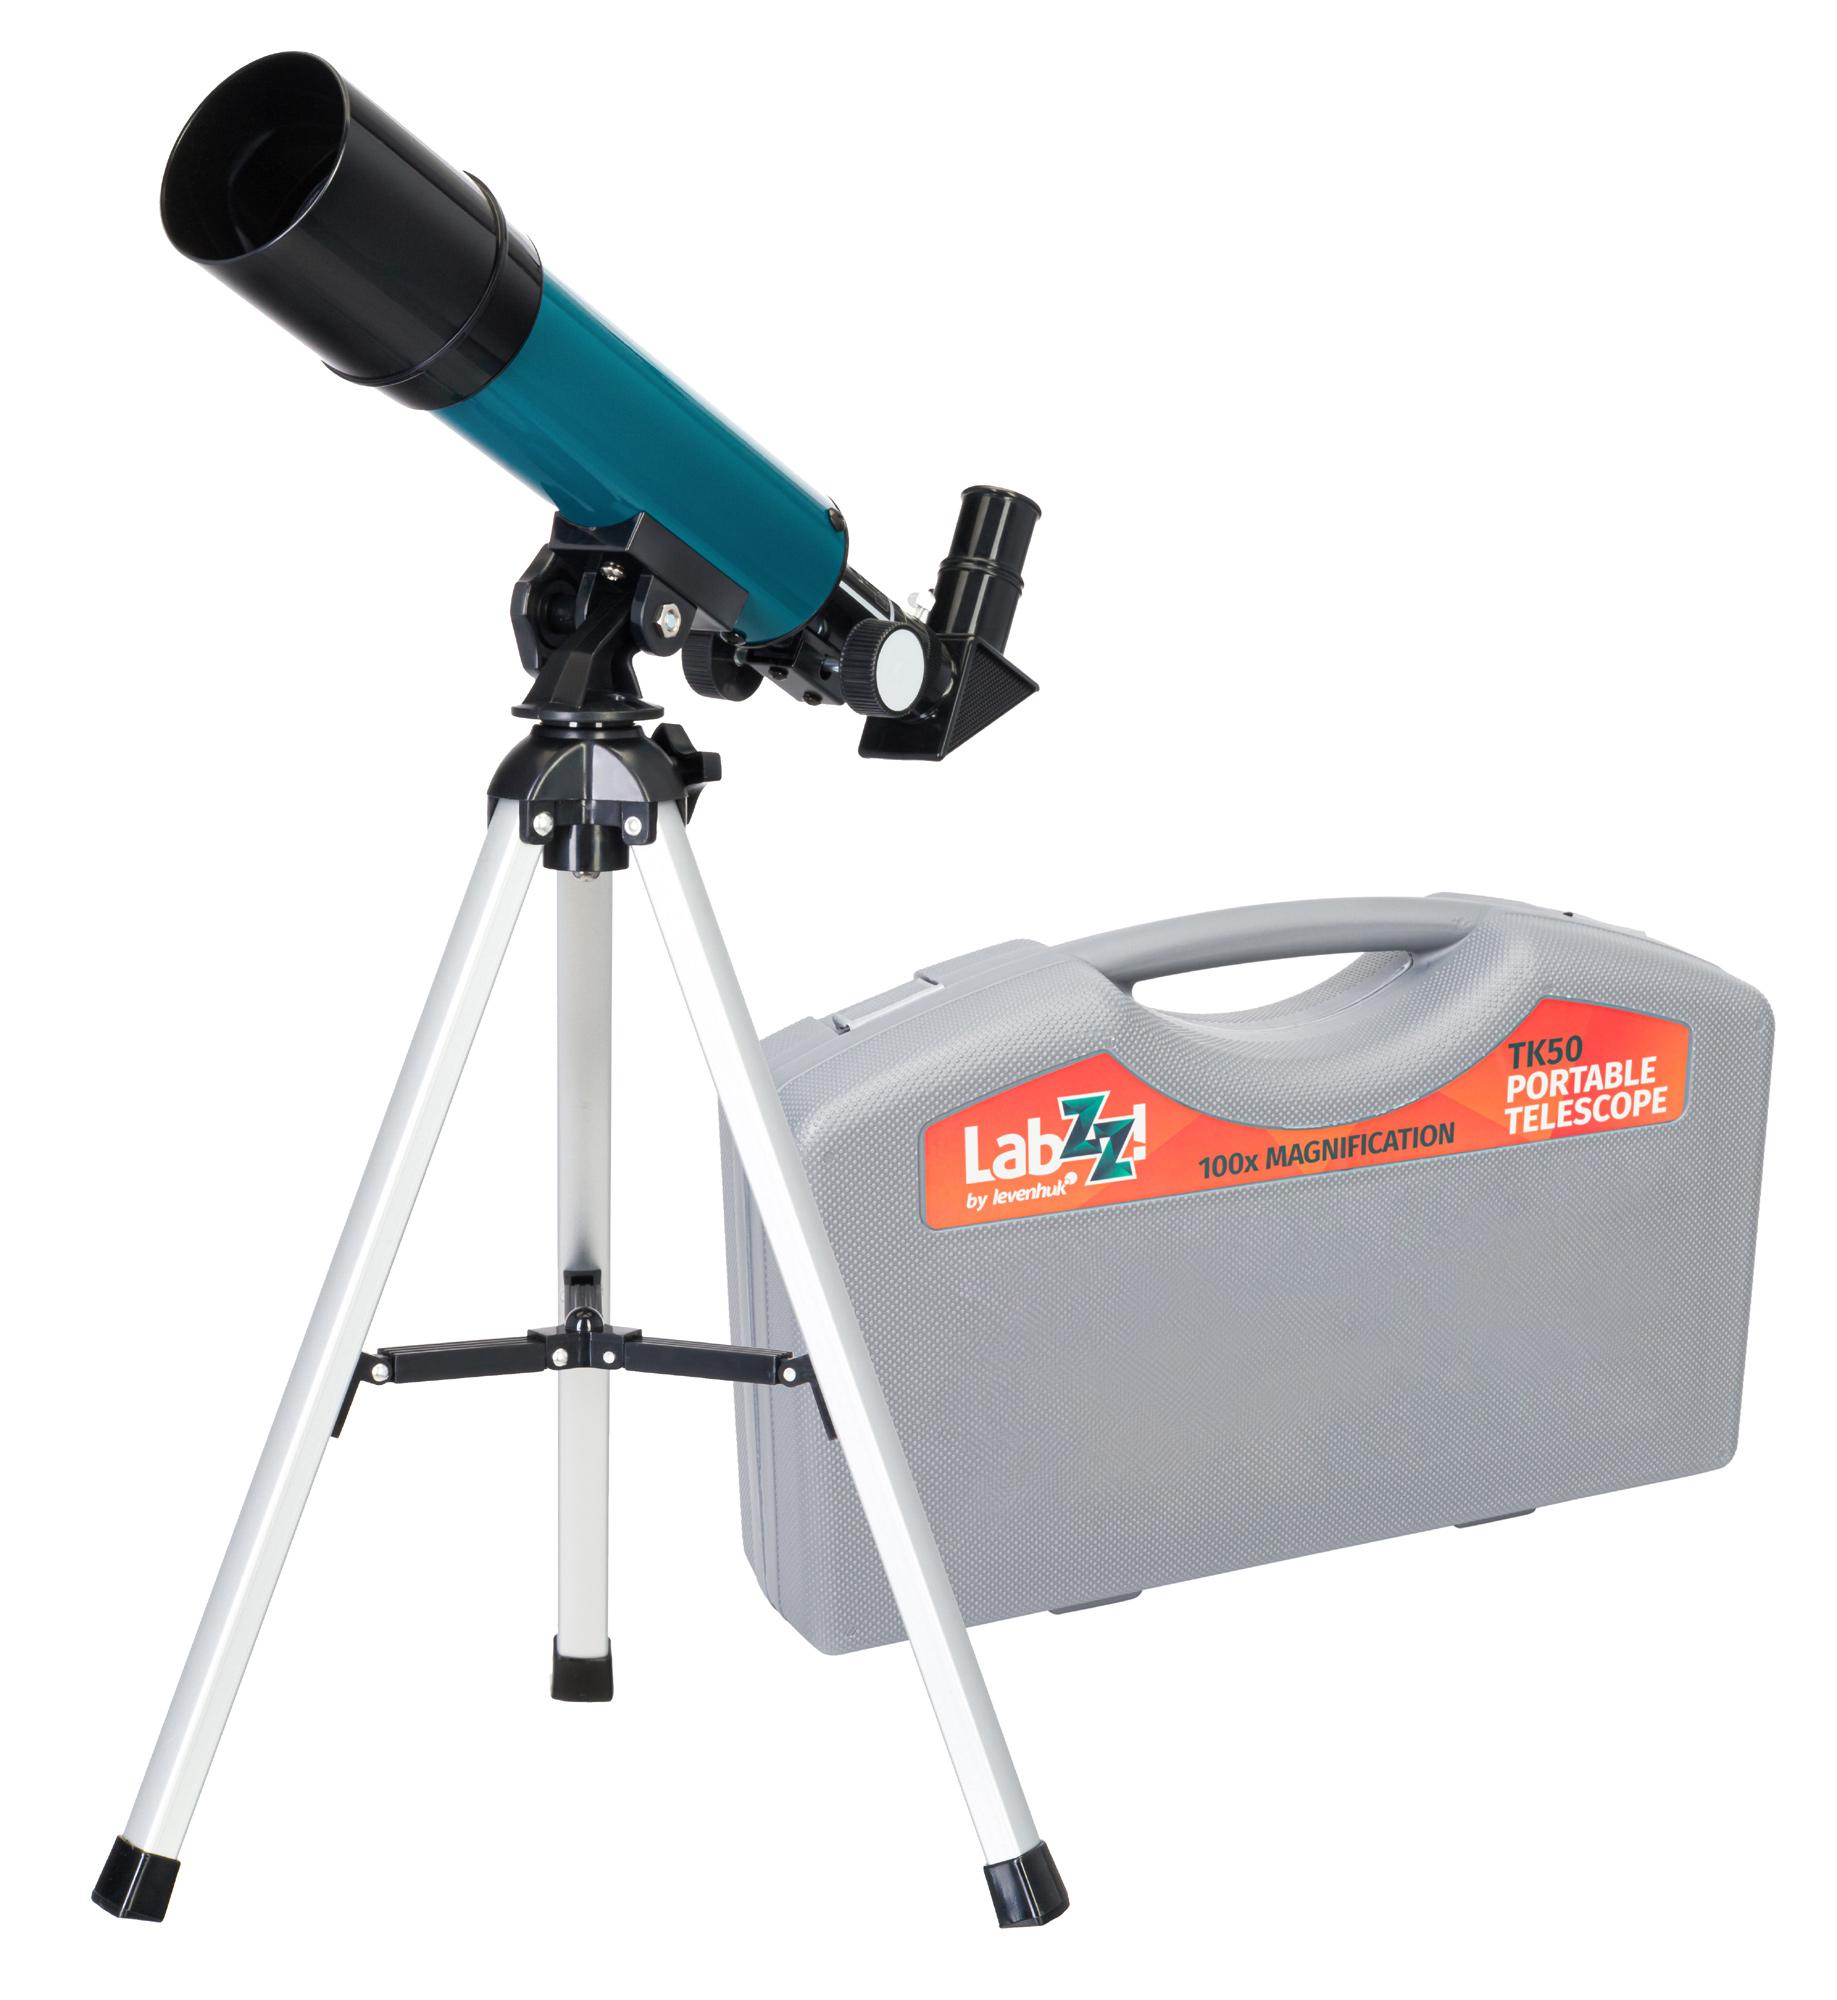 Картинка для Телескоп Levenhuk (Левенгук) LabZZ TK50